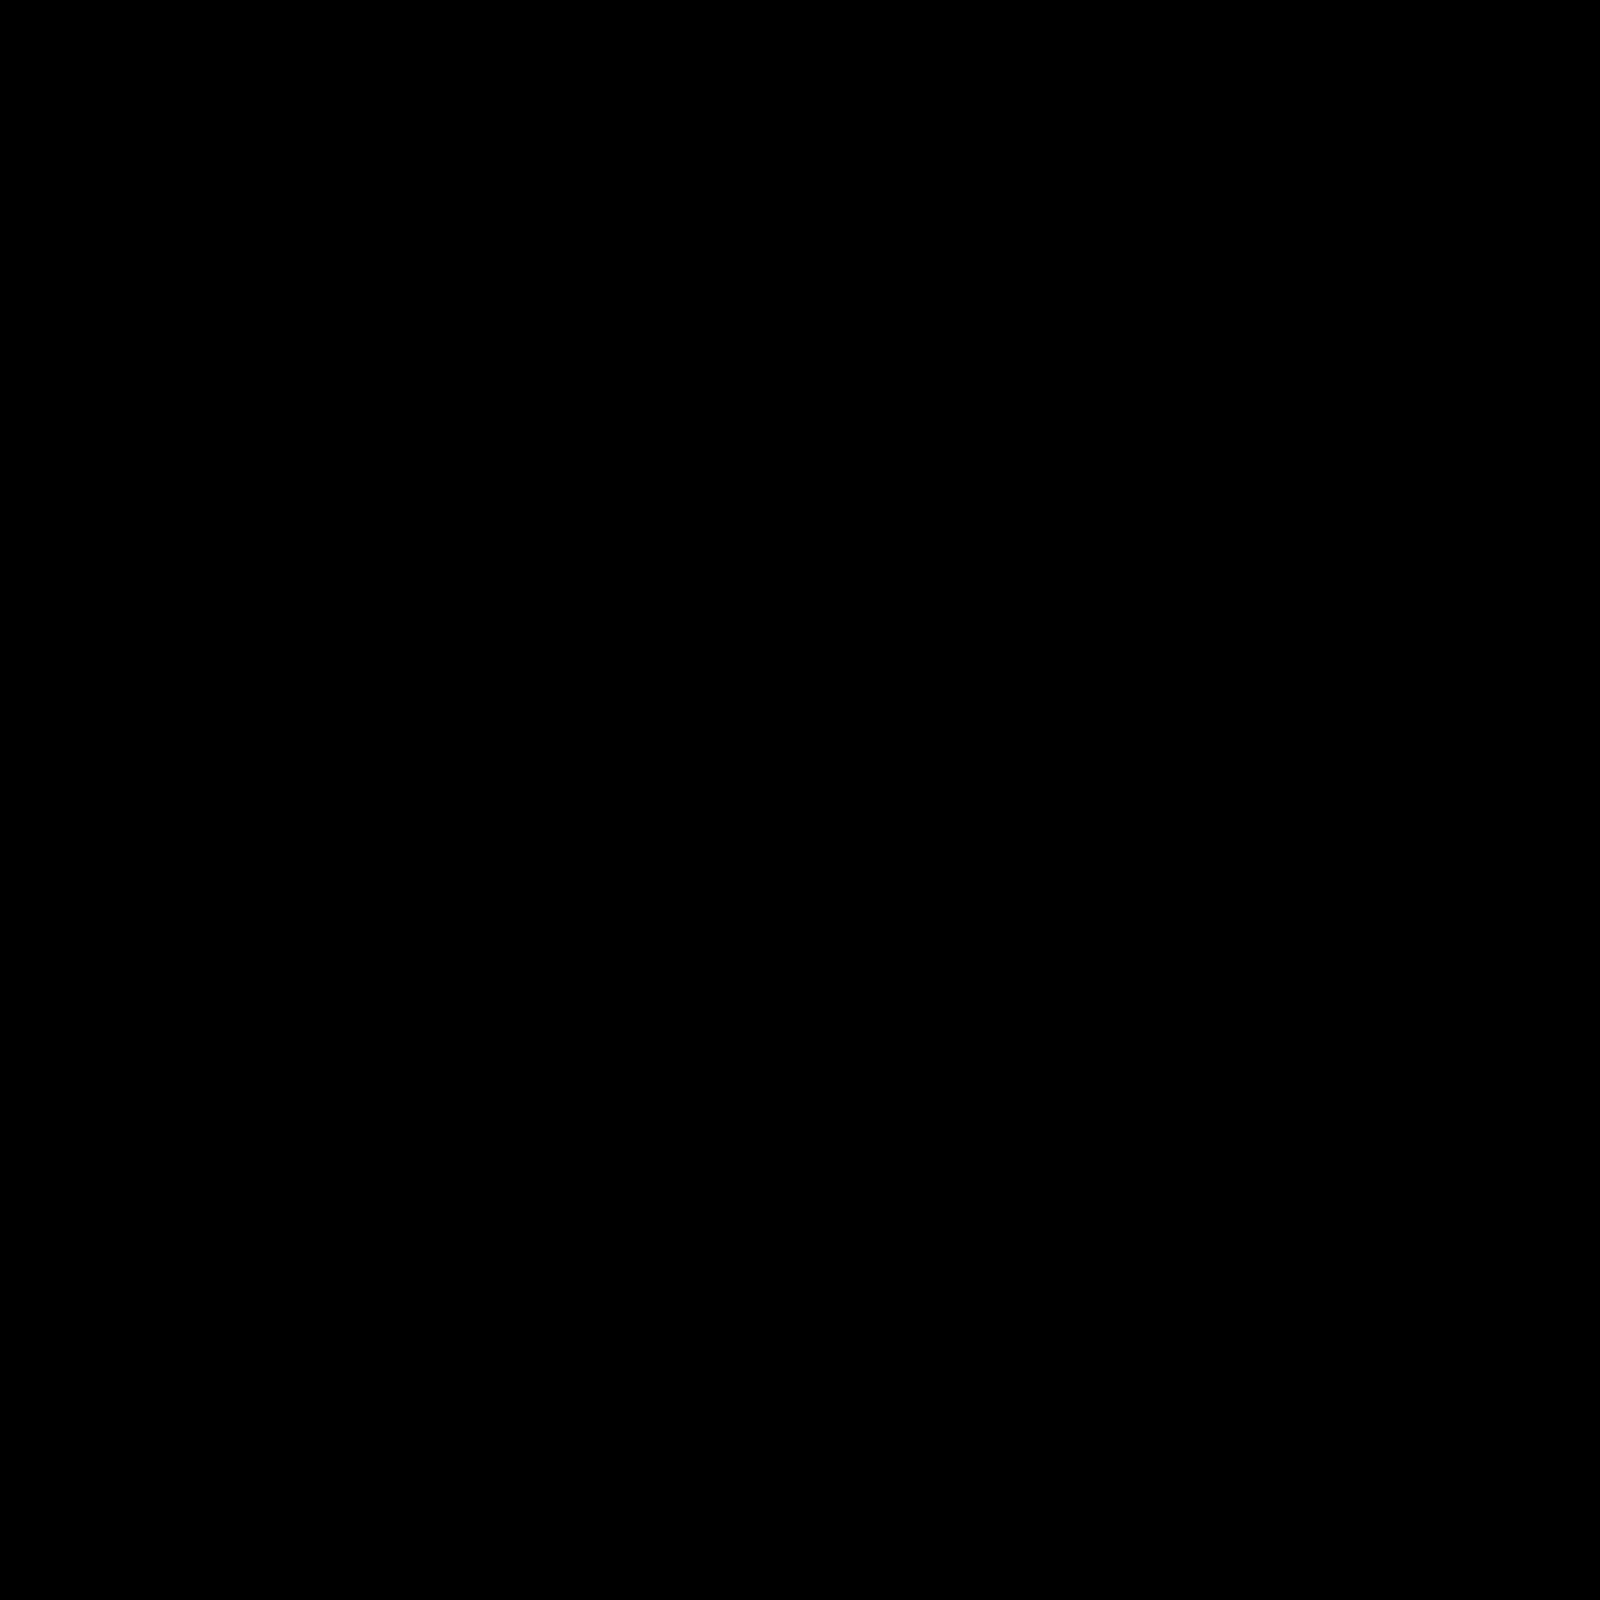 Softball Handbook Filled icon